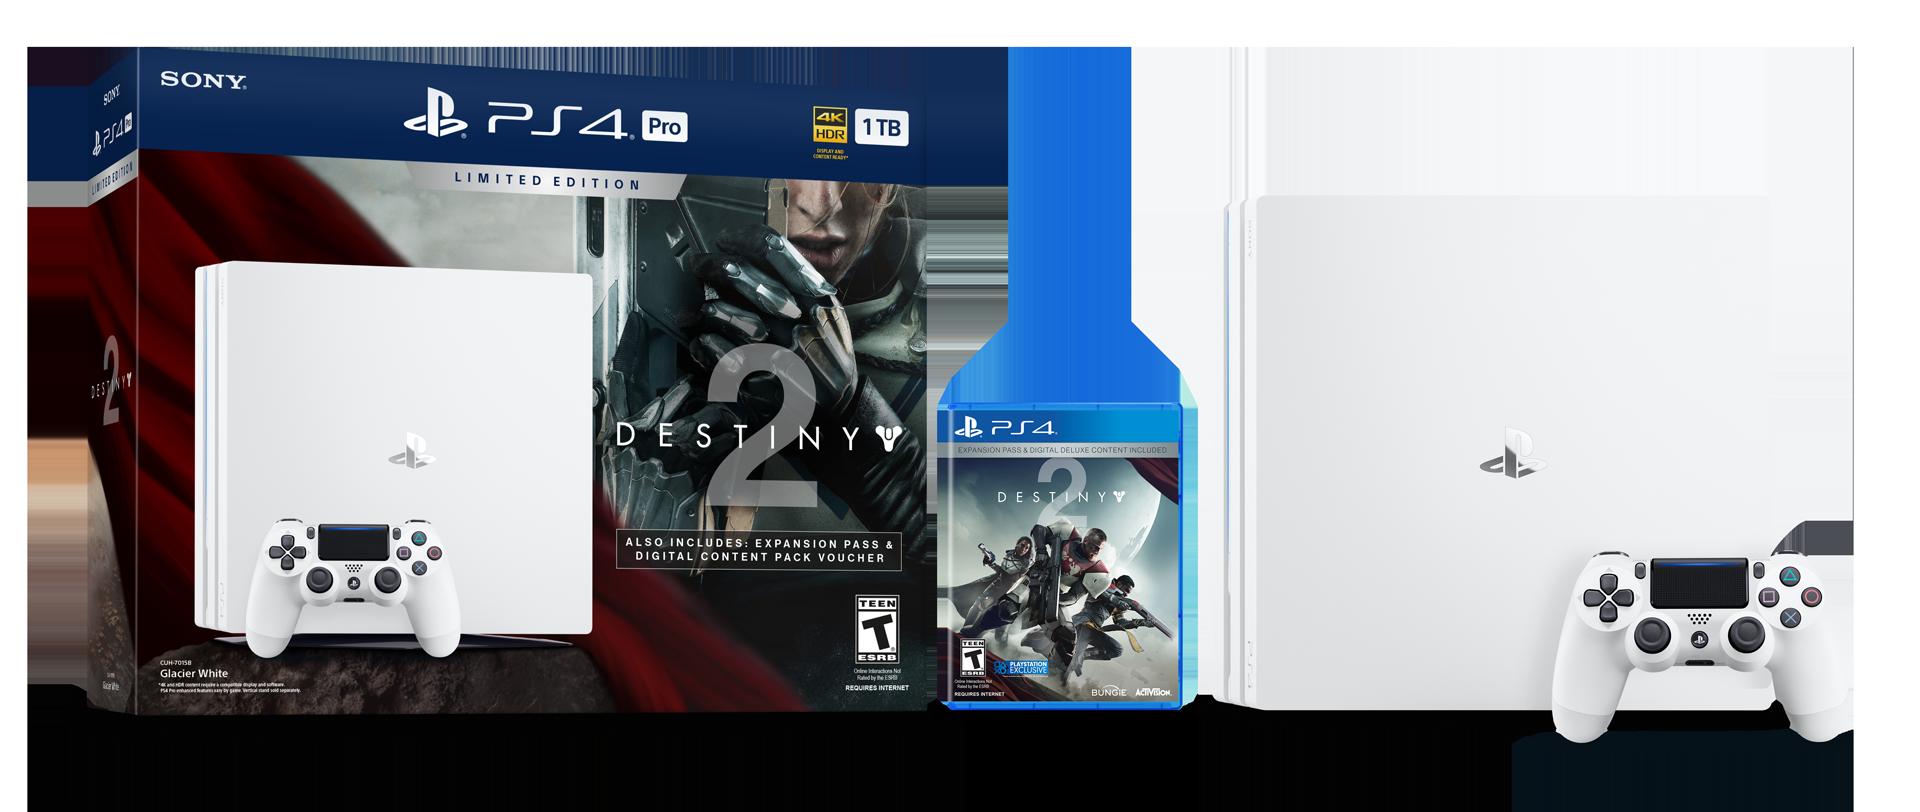 Destiny 2 gets limited edition Glacier White PS4 Pro ...